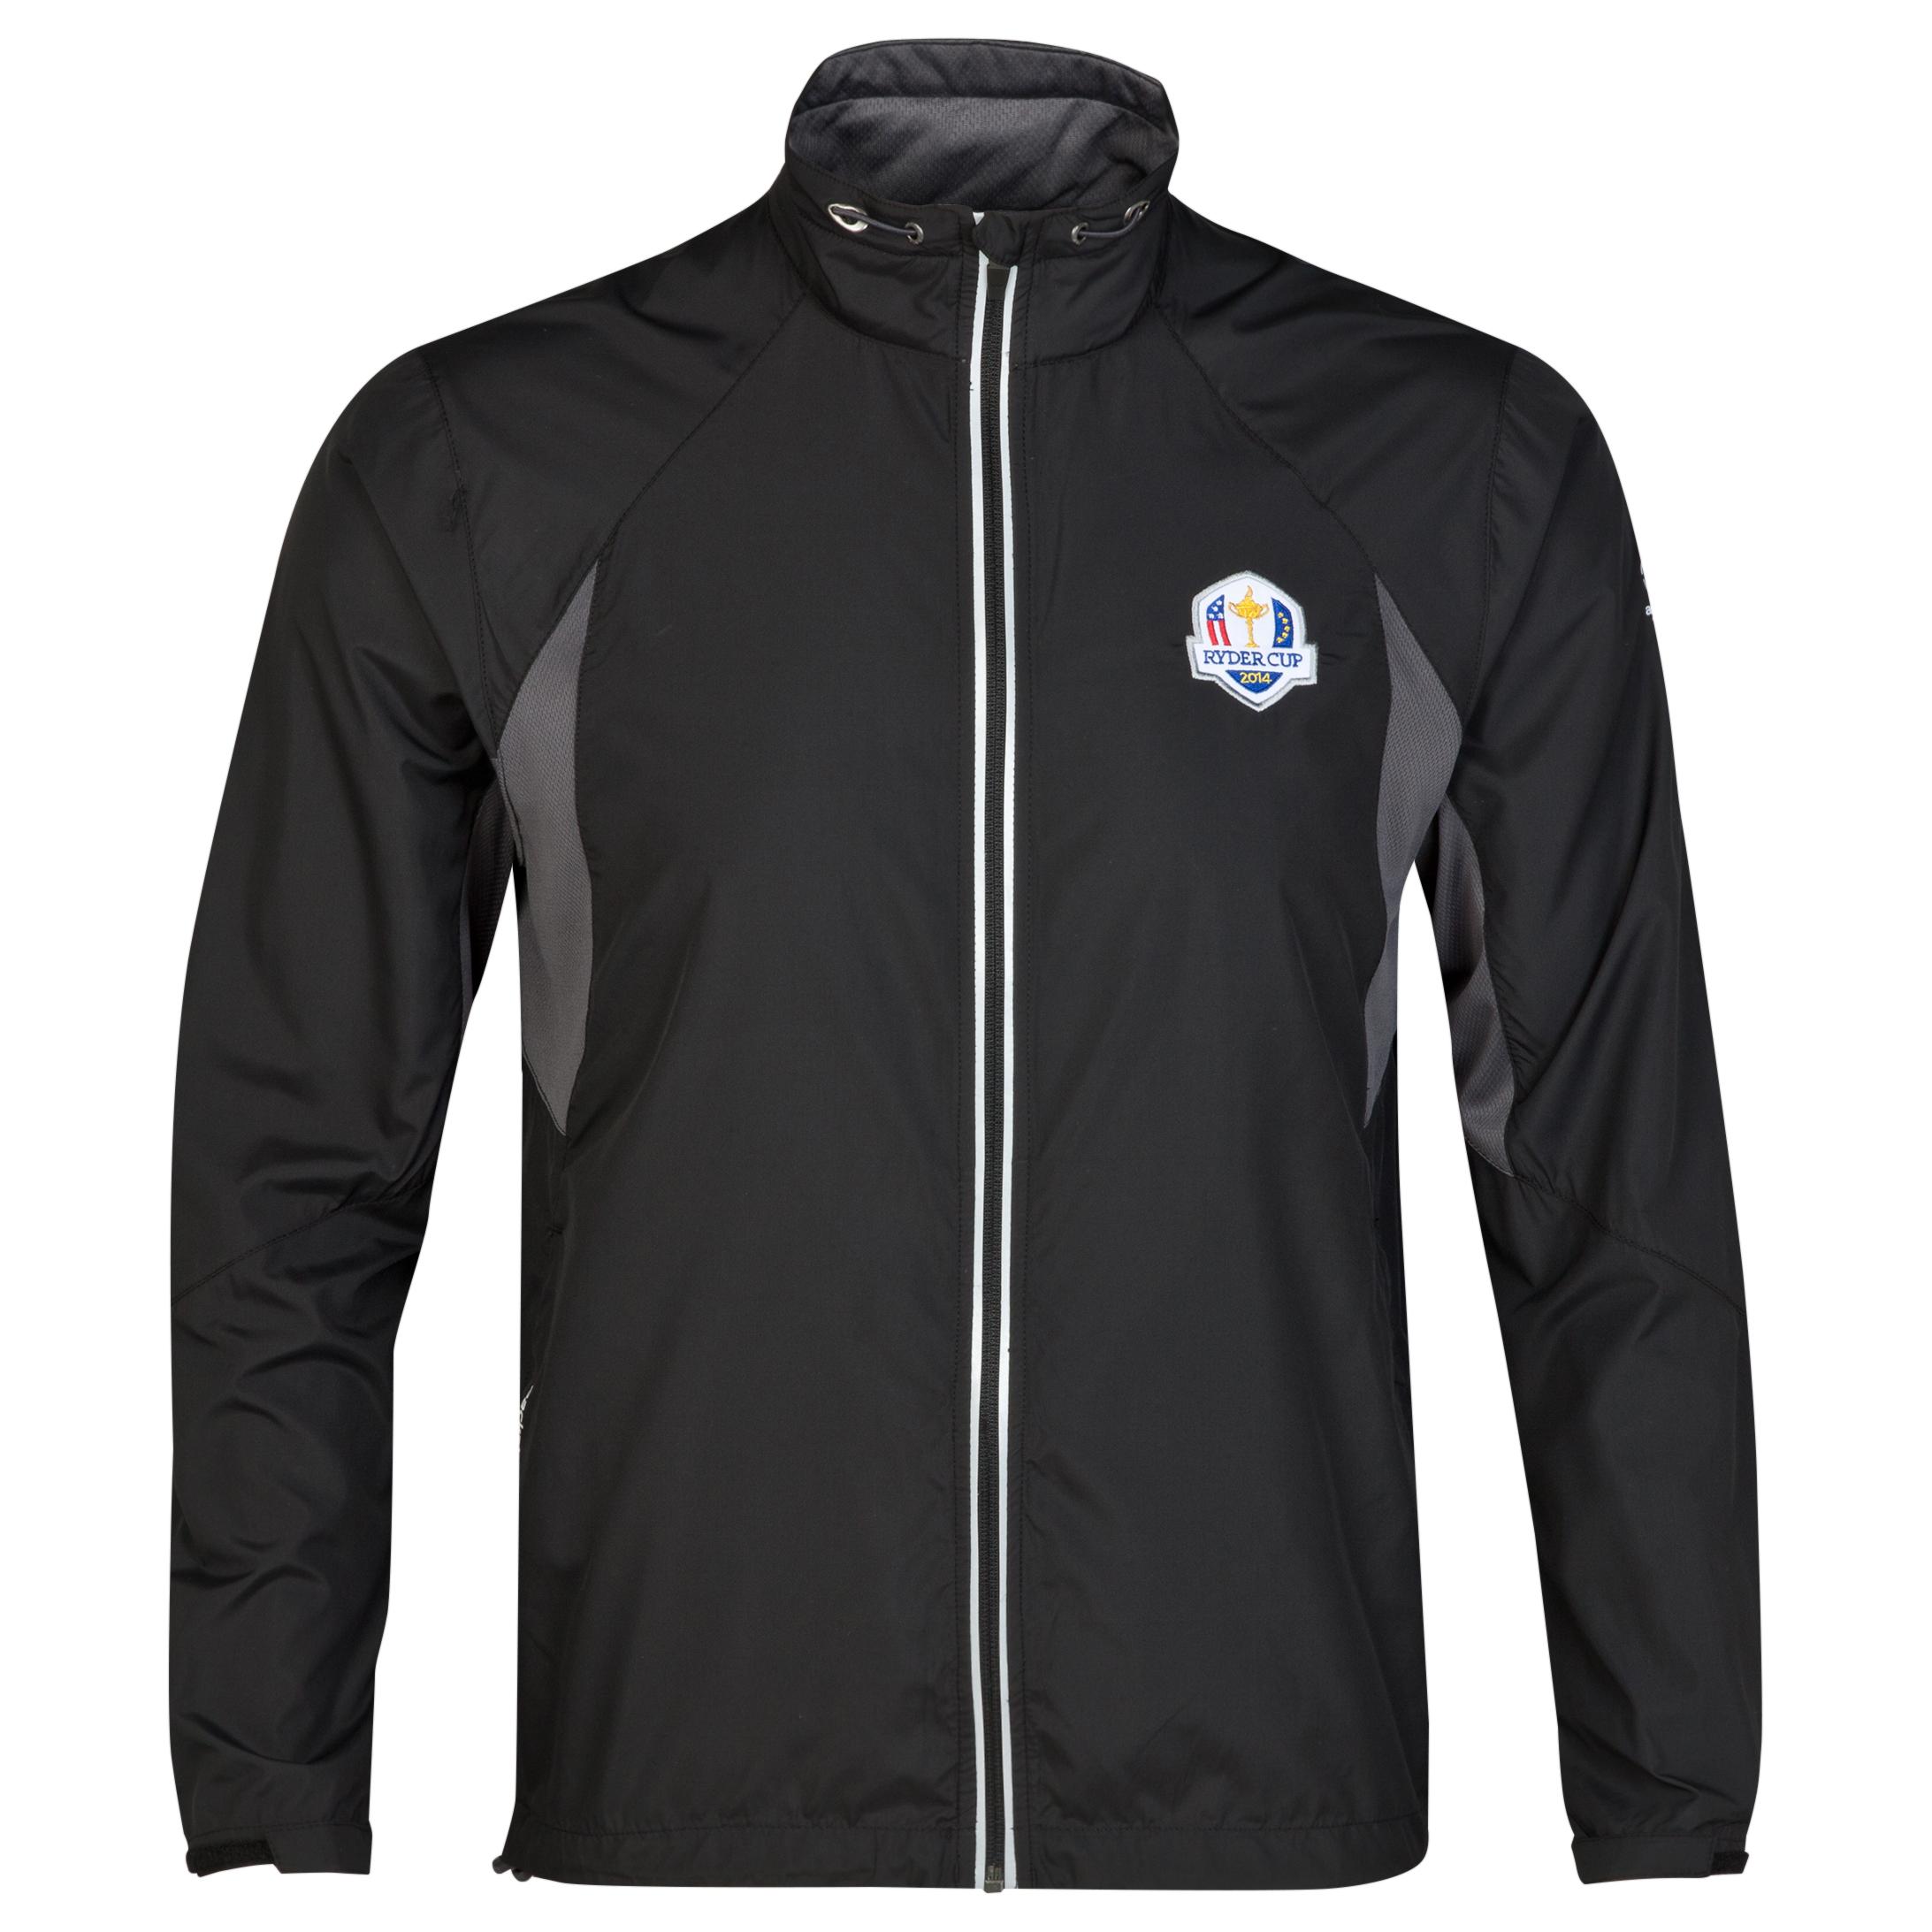 The 2014 Ryder Cup abacus Mens Glade Wind Jacket - Black